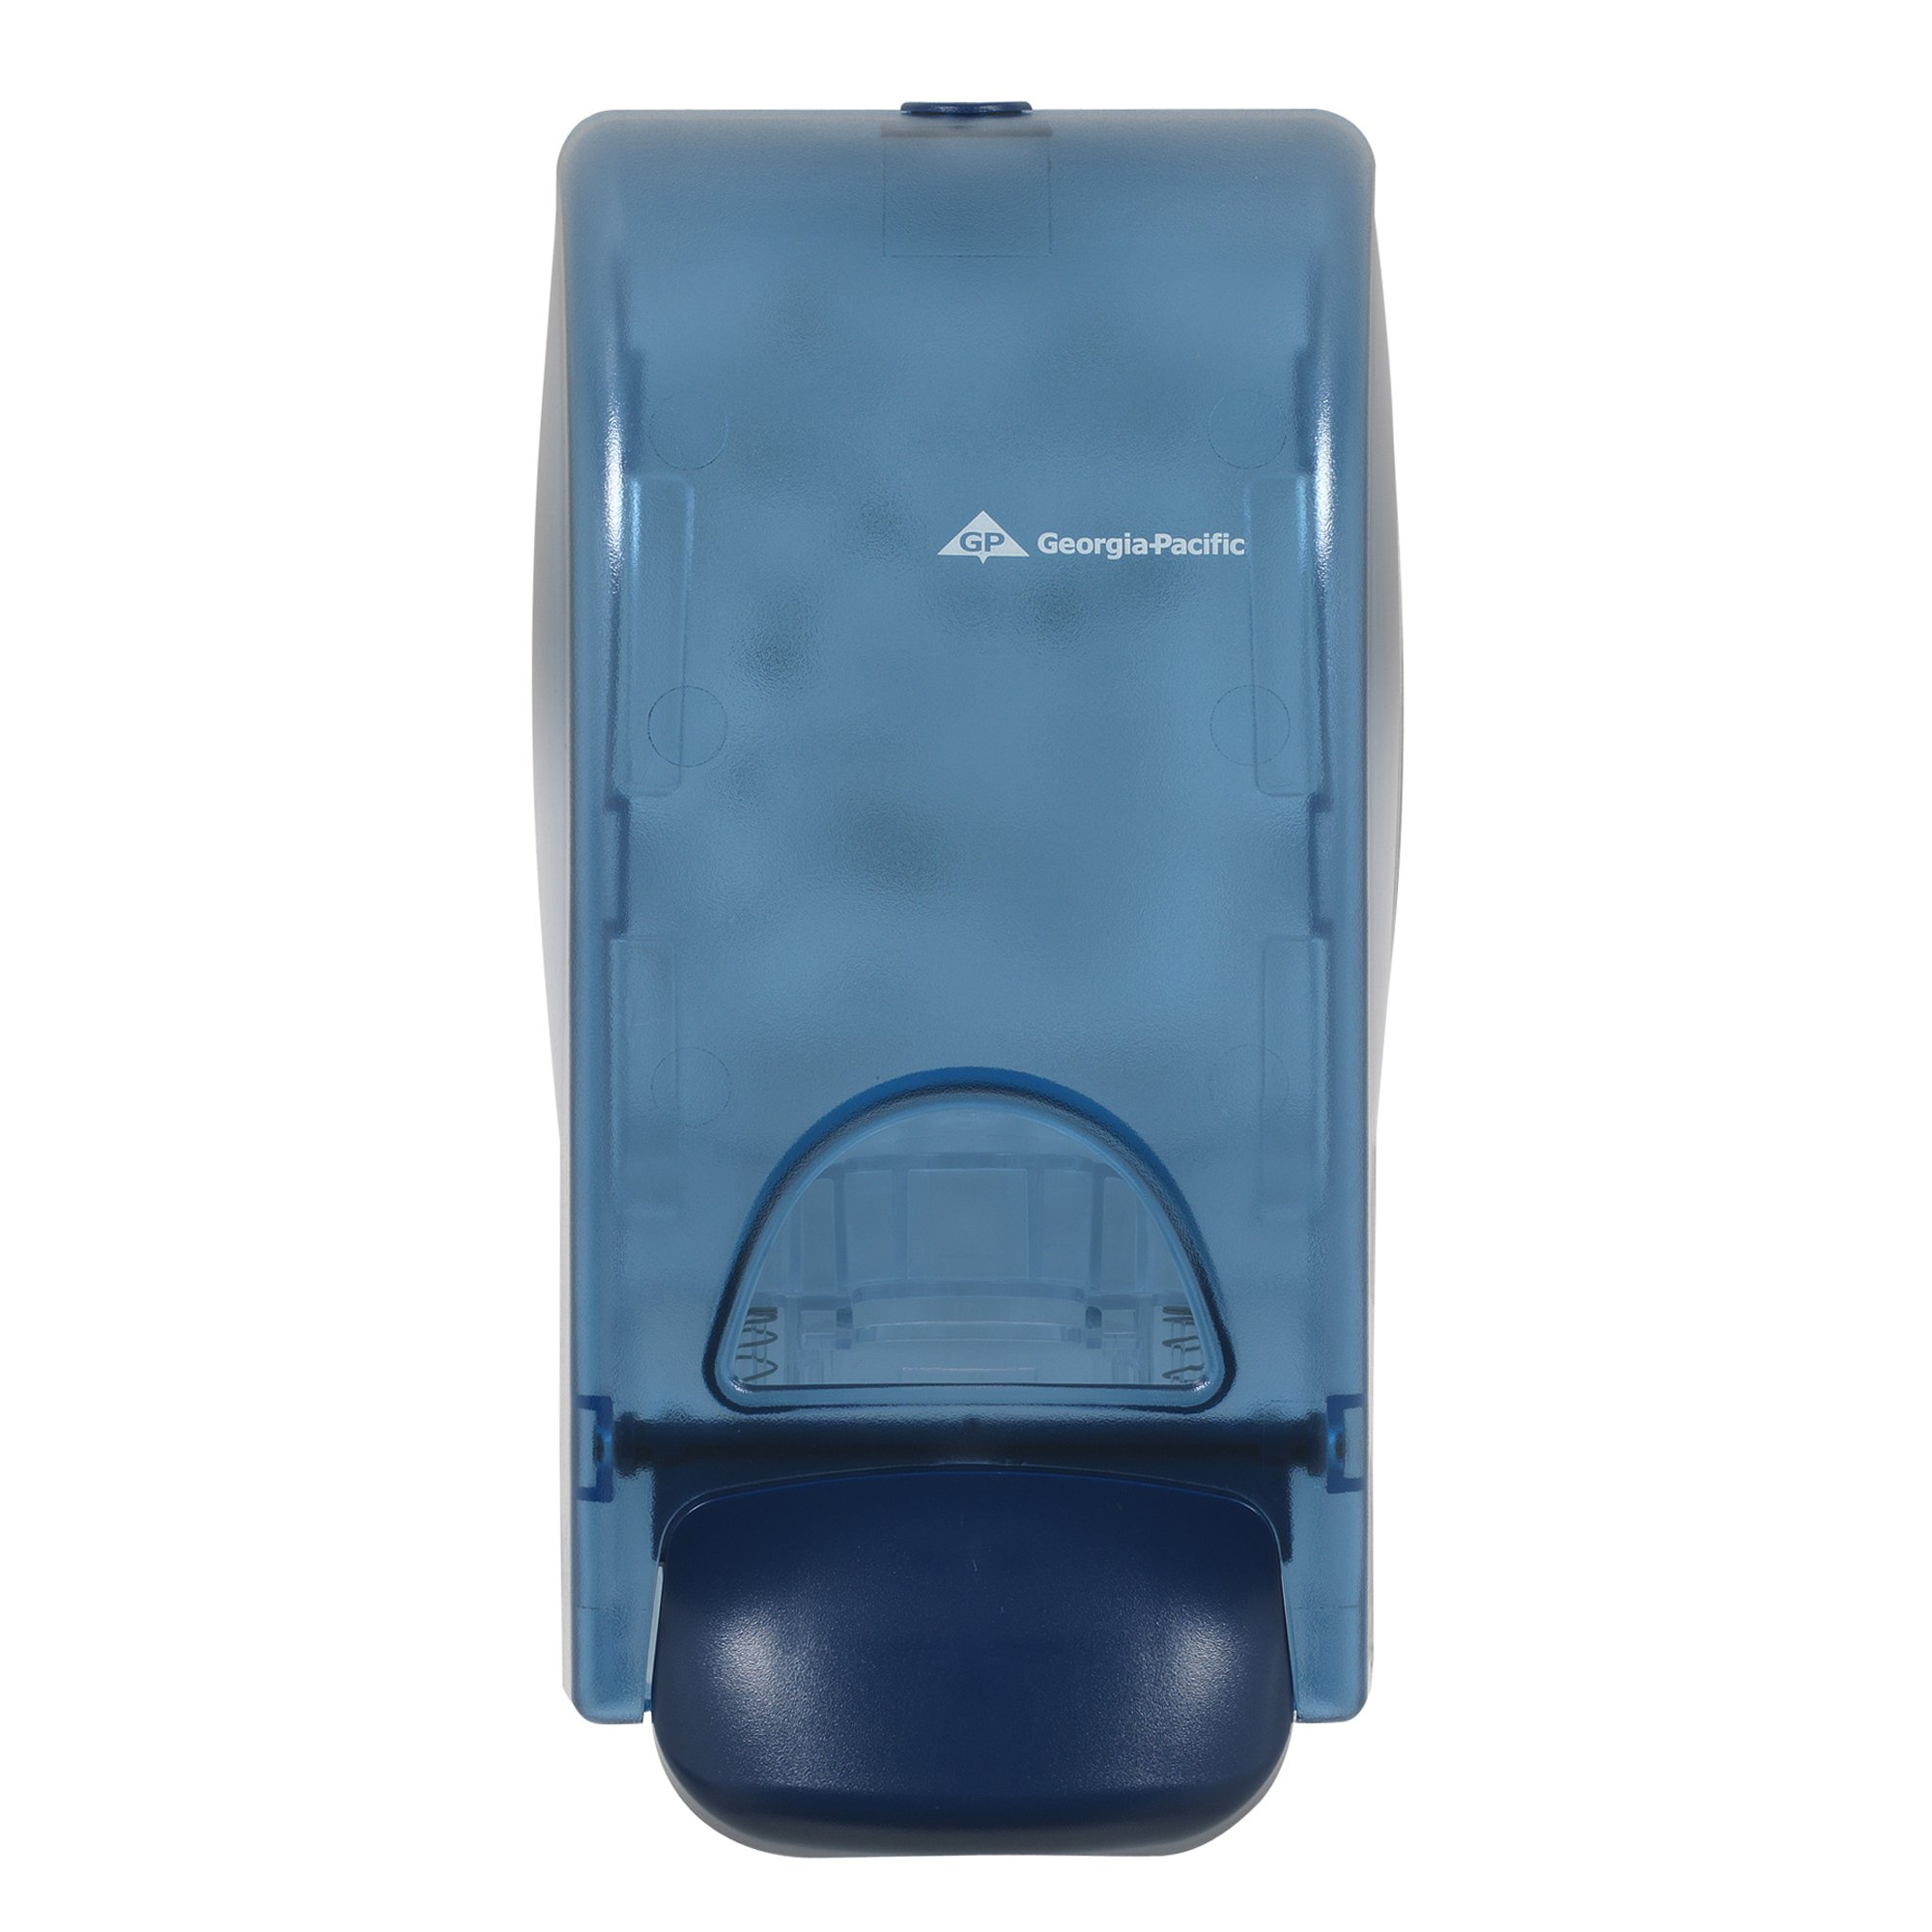 Georgia-Pacific 53052 Splash Blue Manual Soap and Sanitizer Dispenser, 5.6'' Width x 4.6'' Length